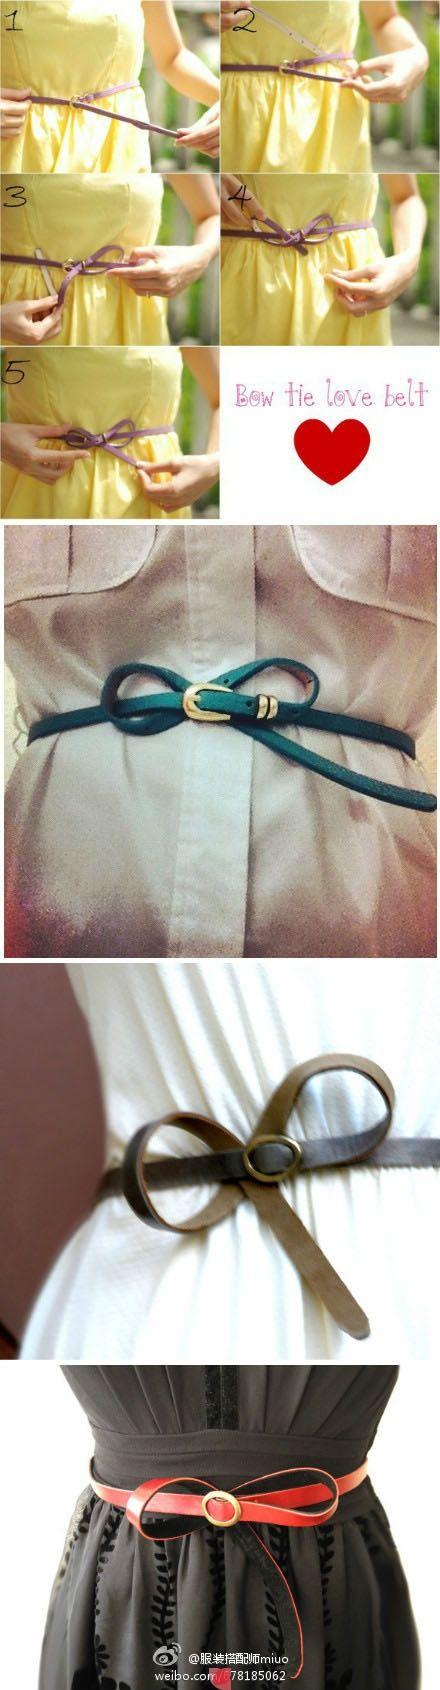 Whoa whoa WHOA!!! A belt bow?!?! I love it! And my belts shall never be worn the same again.